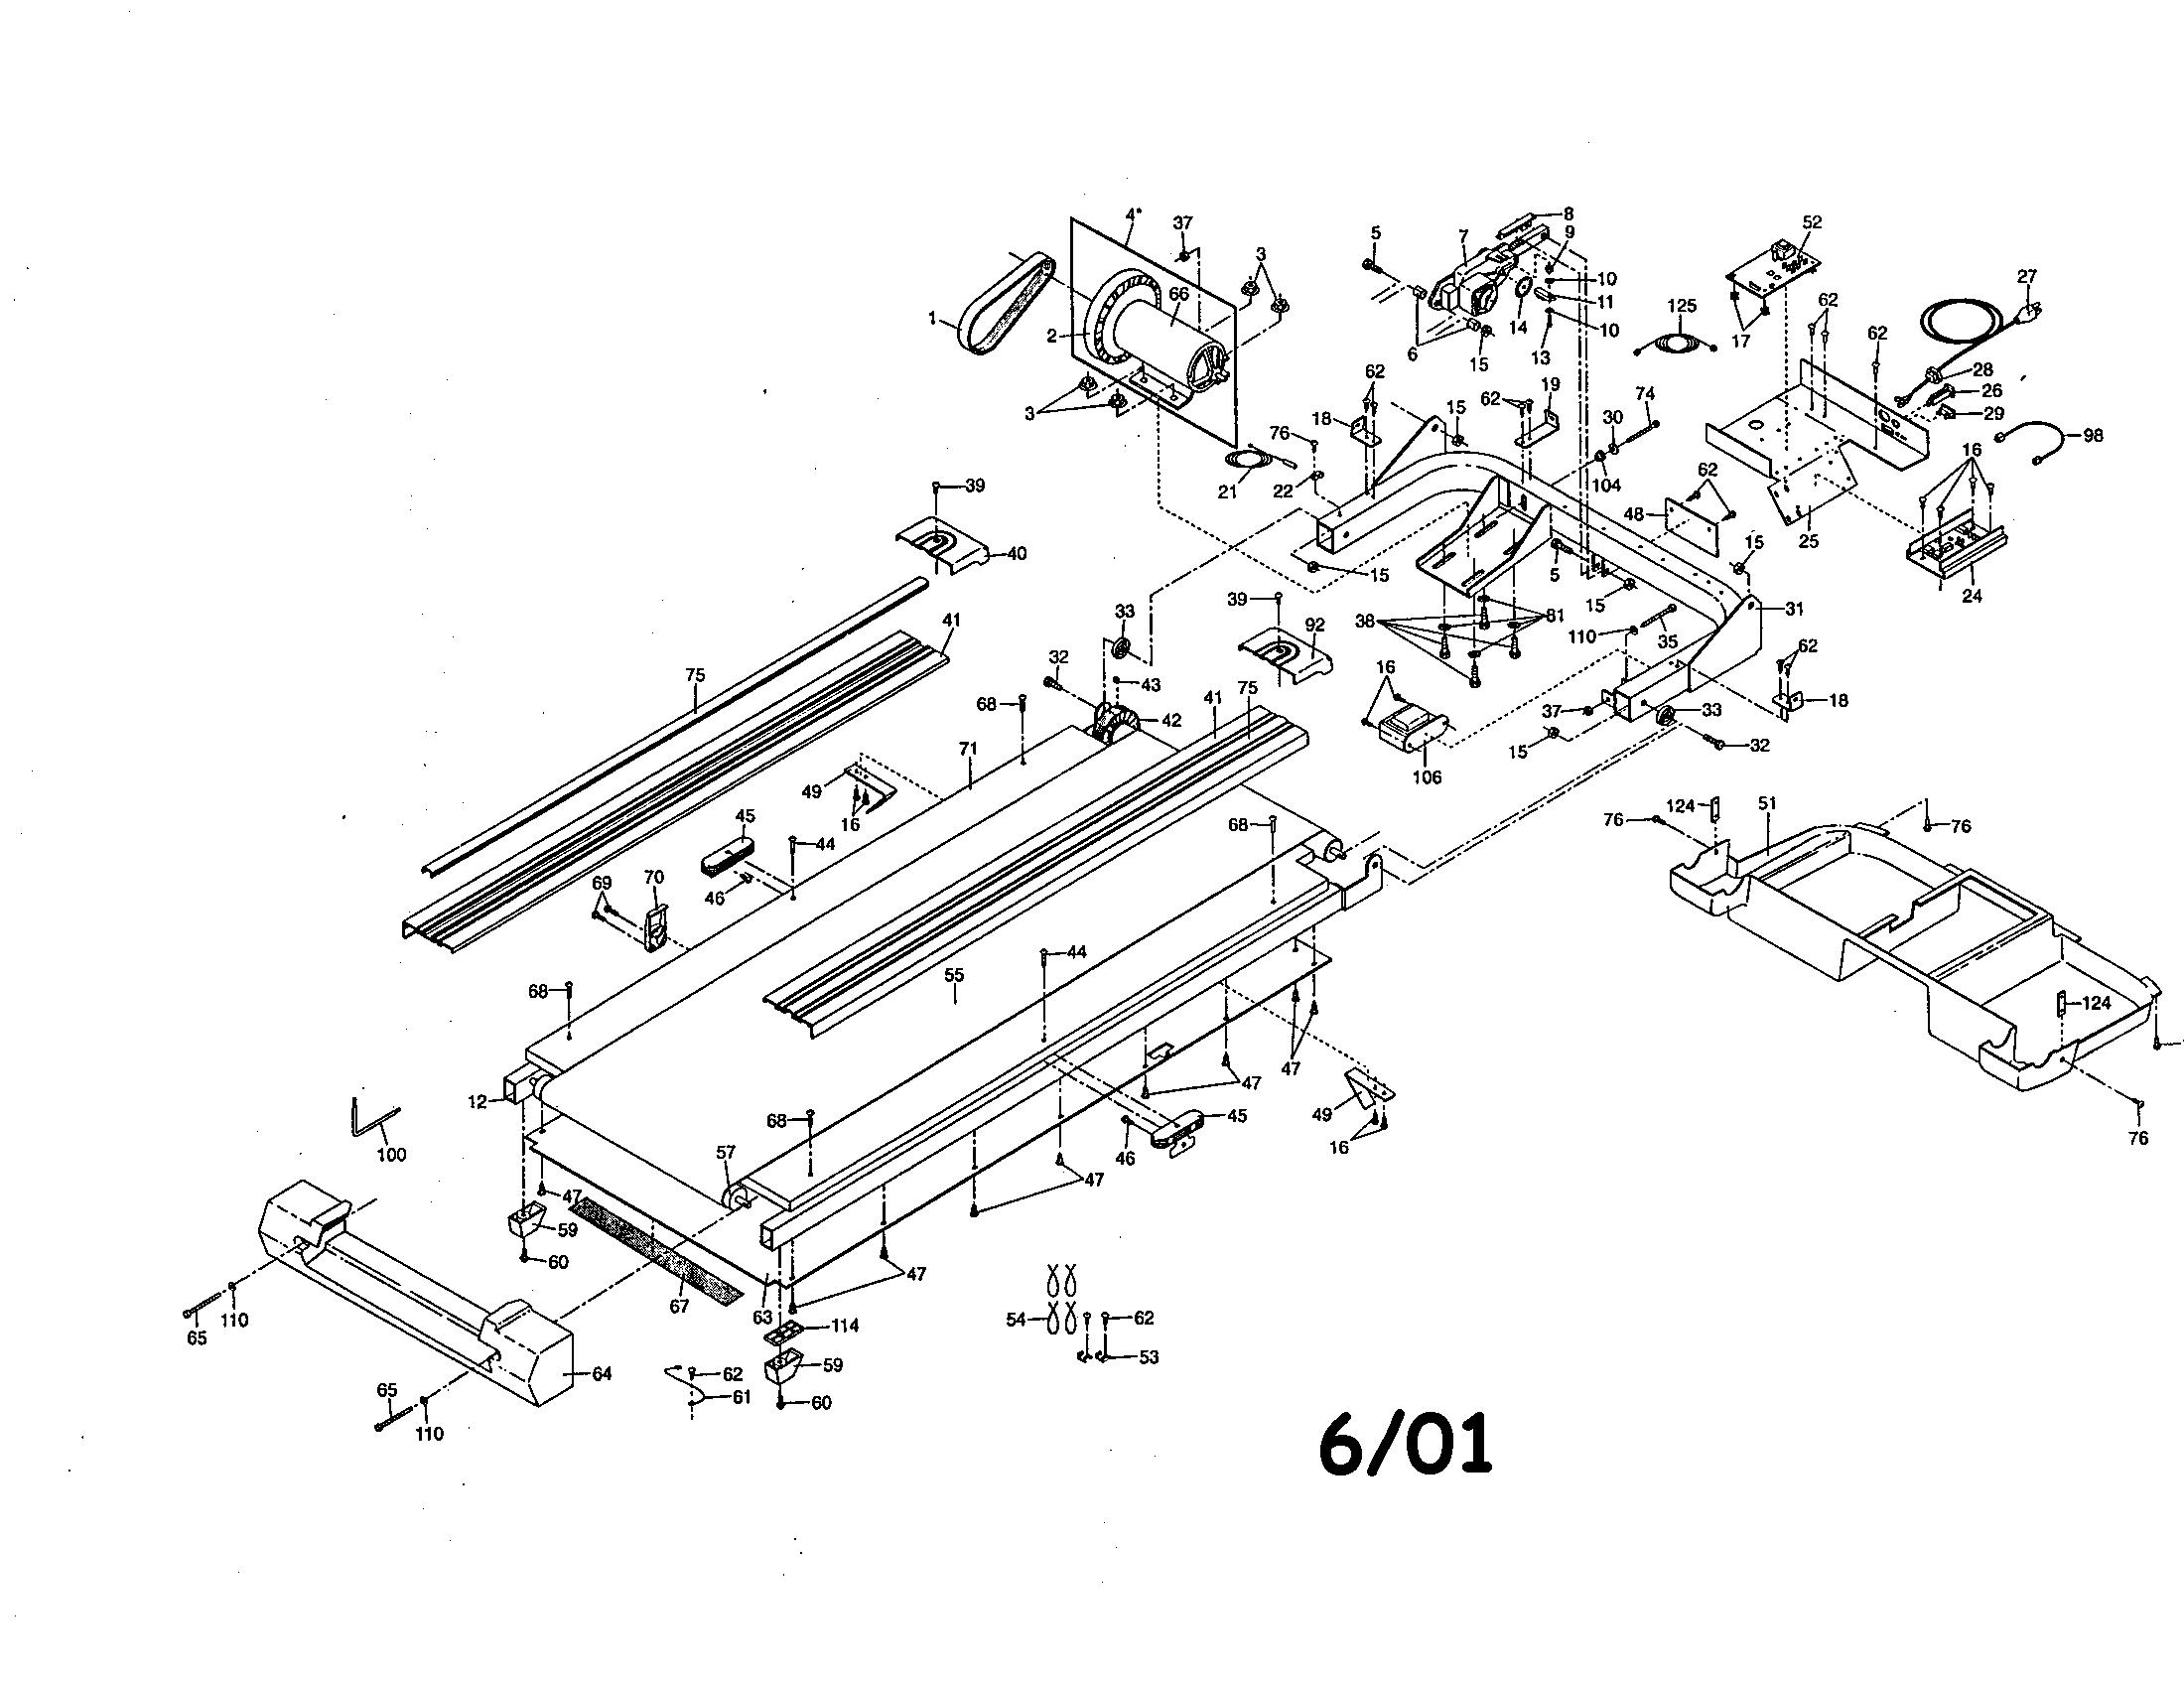 proform mc45 wiring diagram